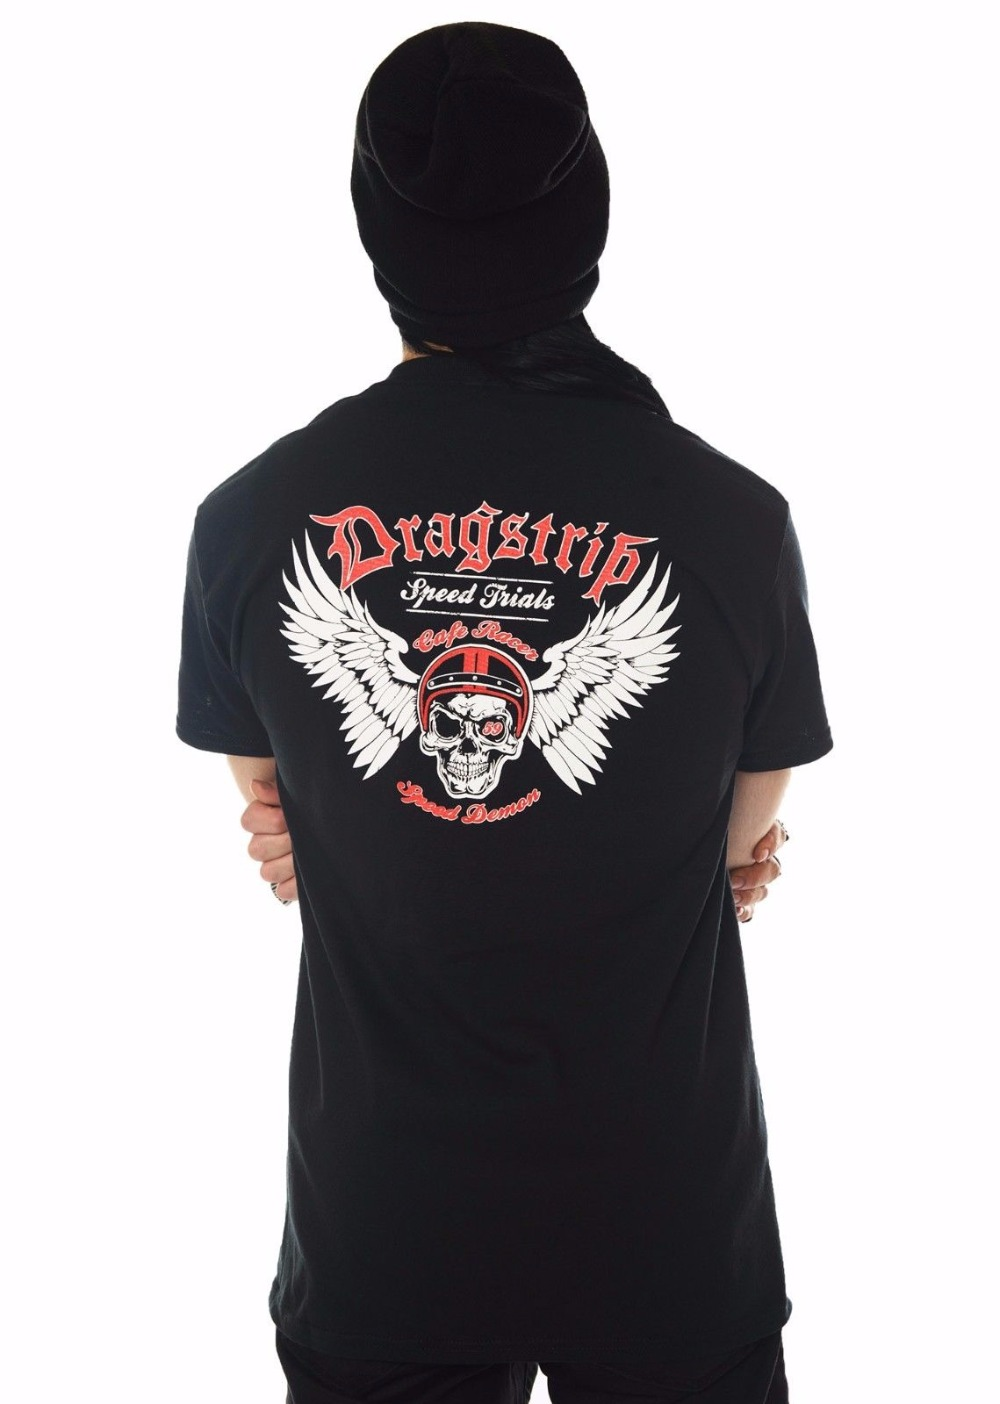 2018 New Brand T Shirt Men Short Sleeve Funny Mens Black Speed Demon Cafe Racer Skull Wings Biker slim Fit Tee Shirts